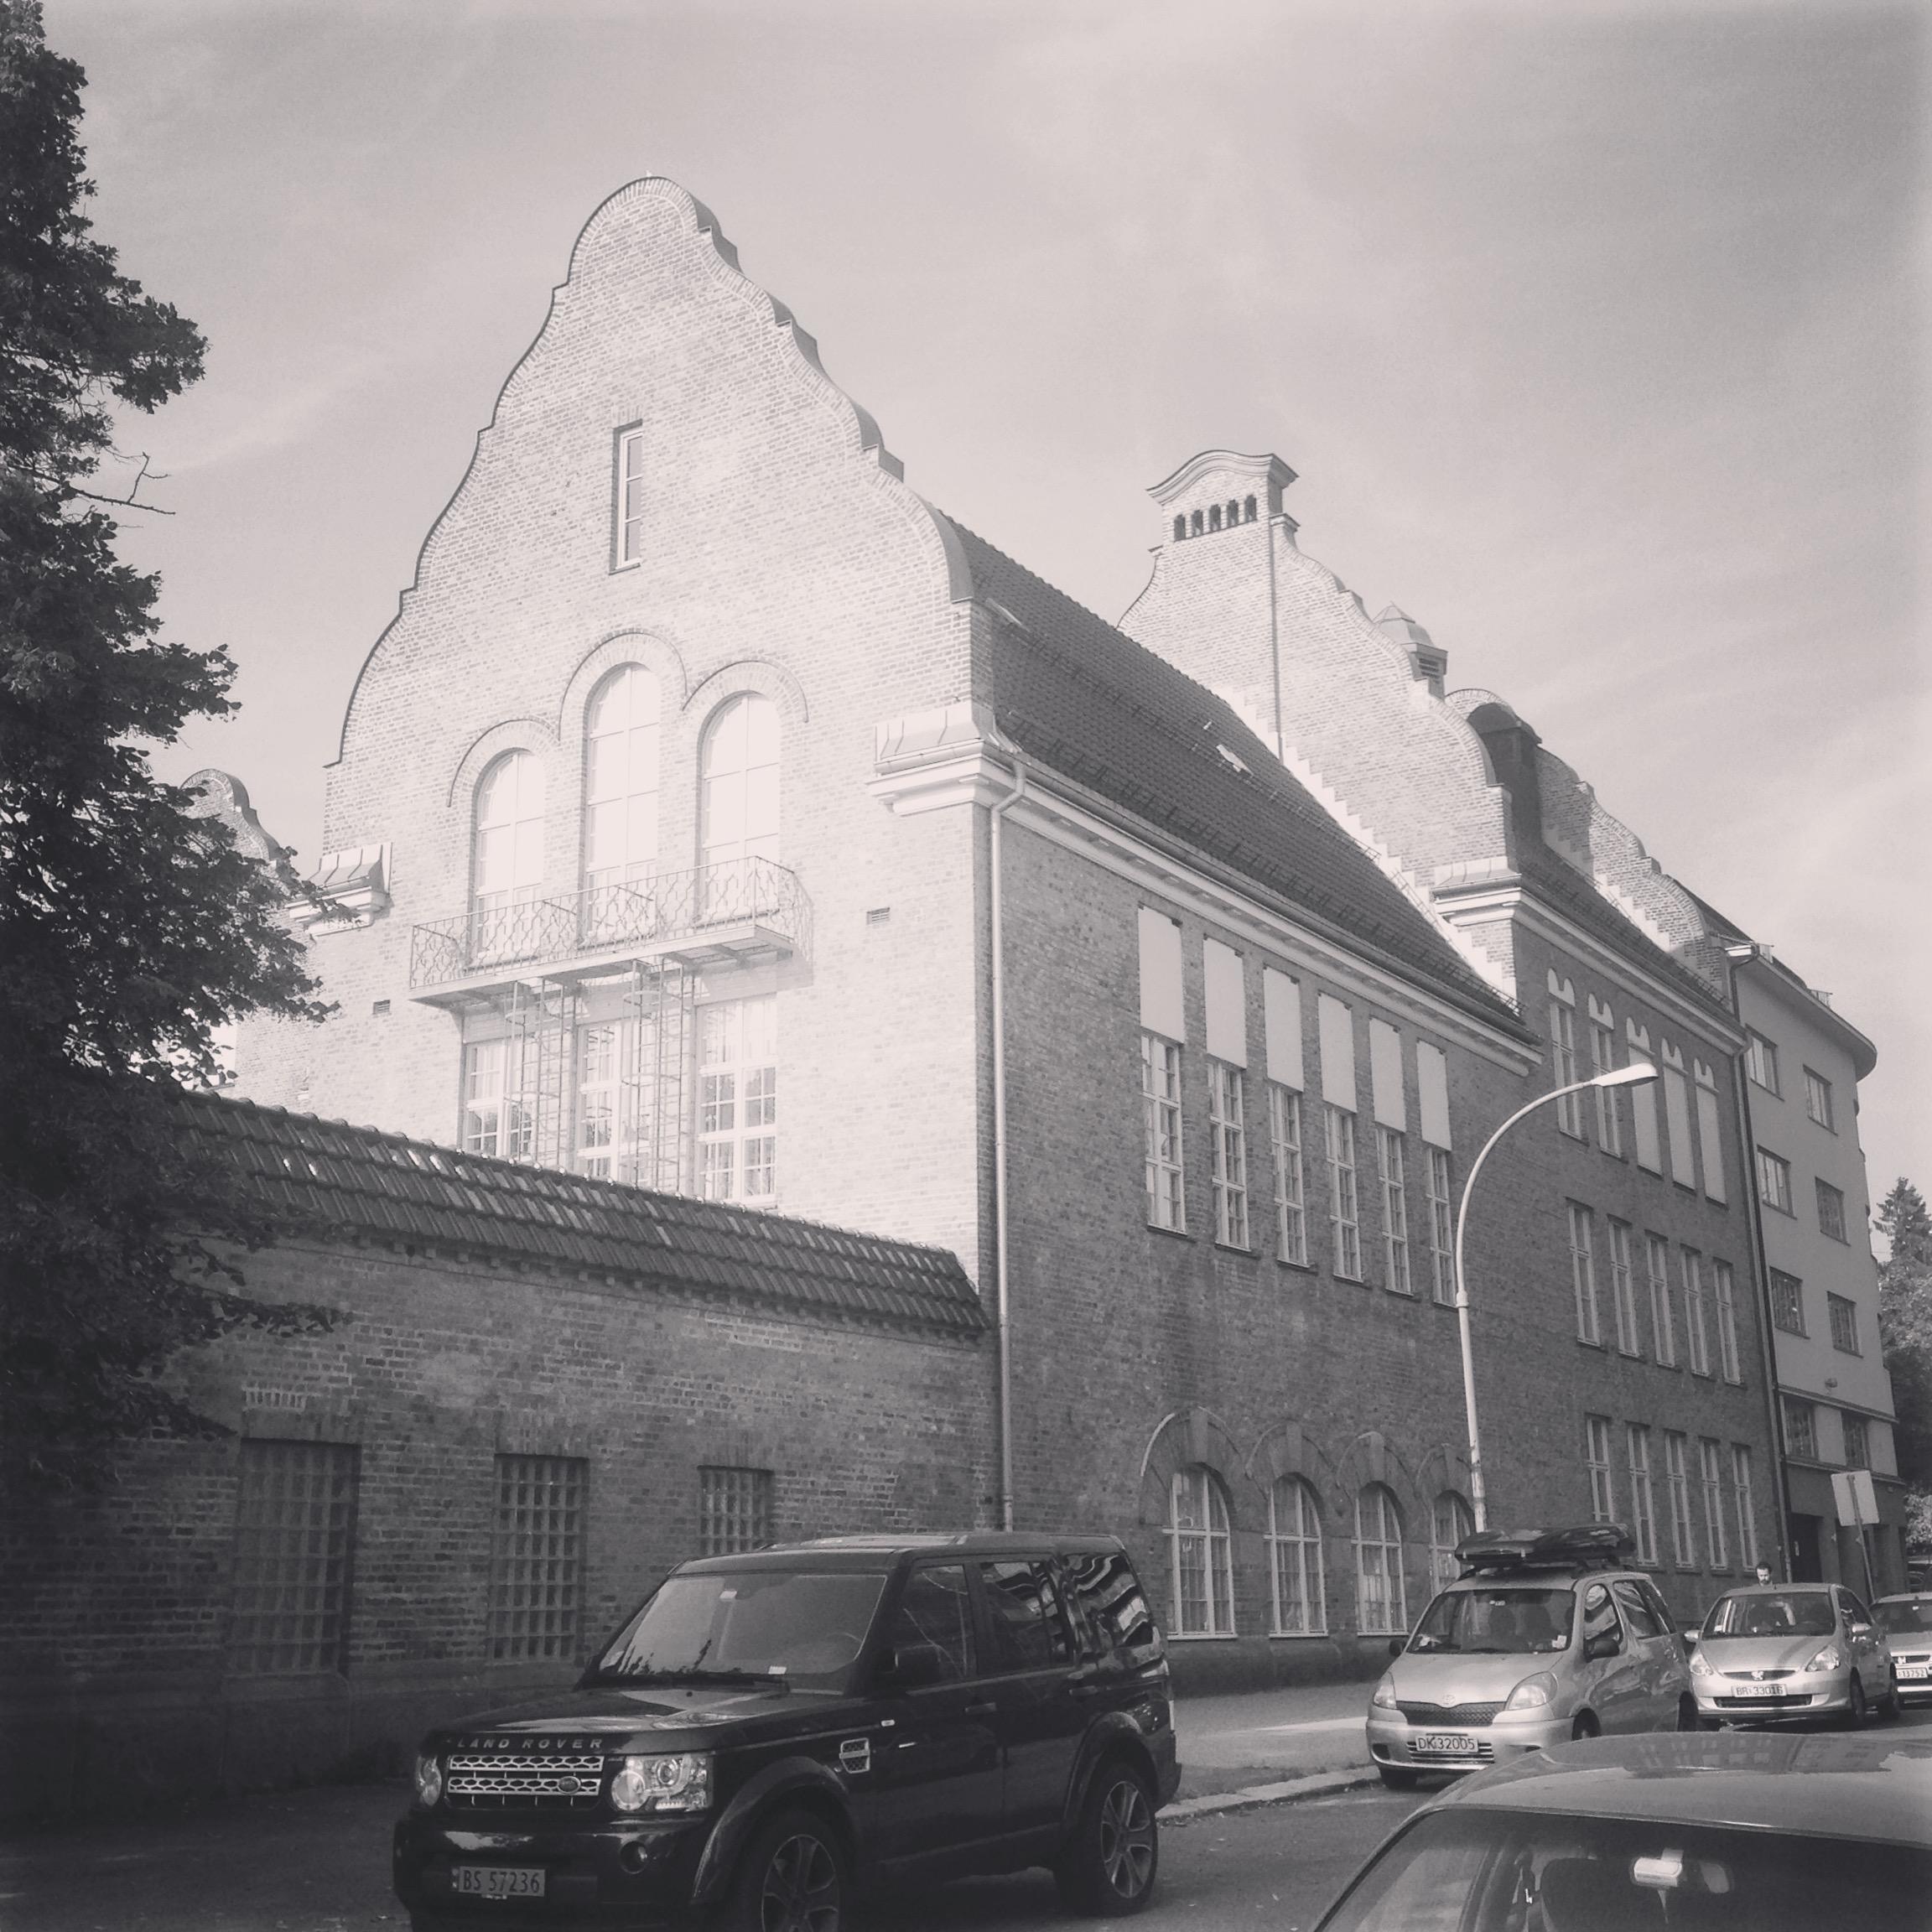 09/2016 - Kontoret ligger vegg-i-vegg med Fagerborg skole, arkitekt: Harald Aars.